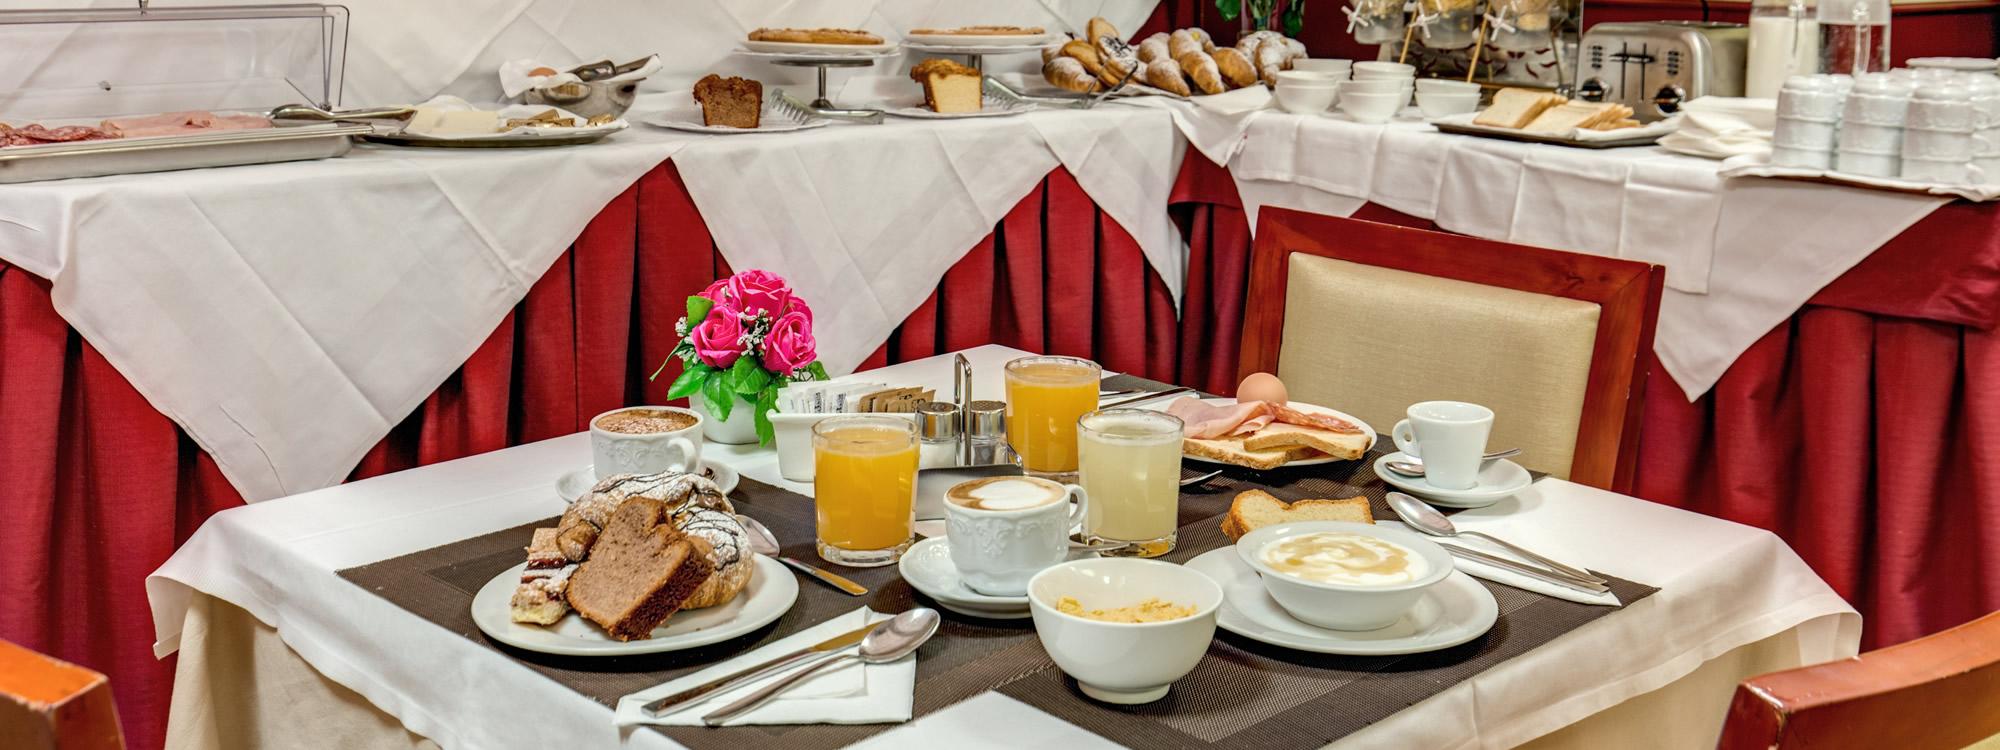 hotel flower garden rome – official site – 3 star hotel